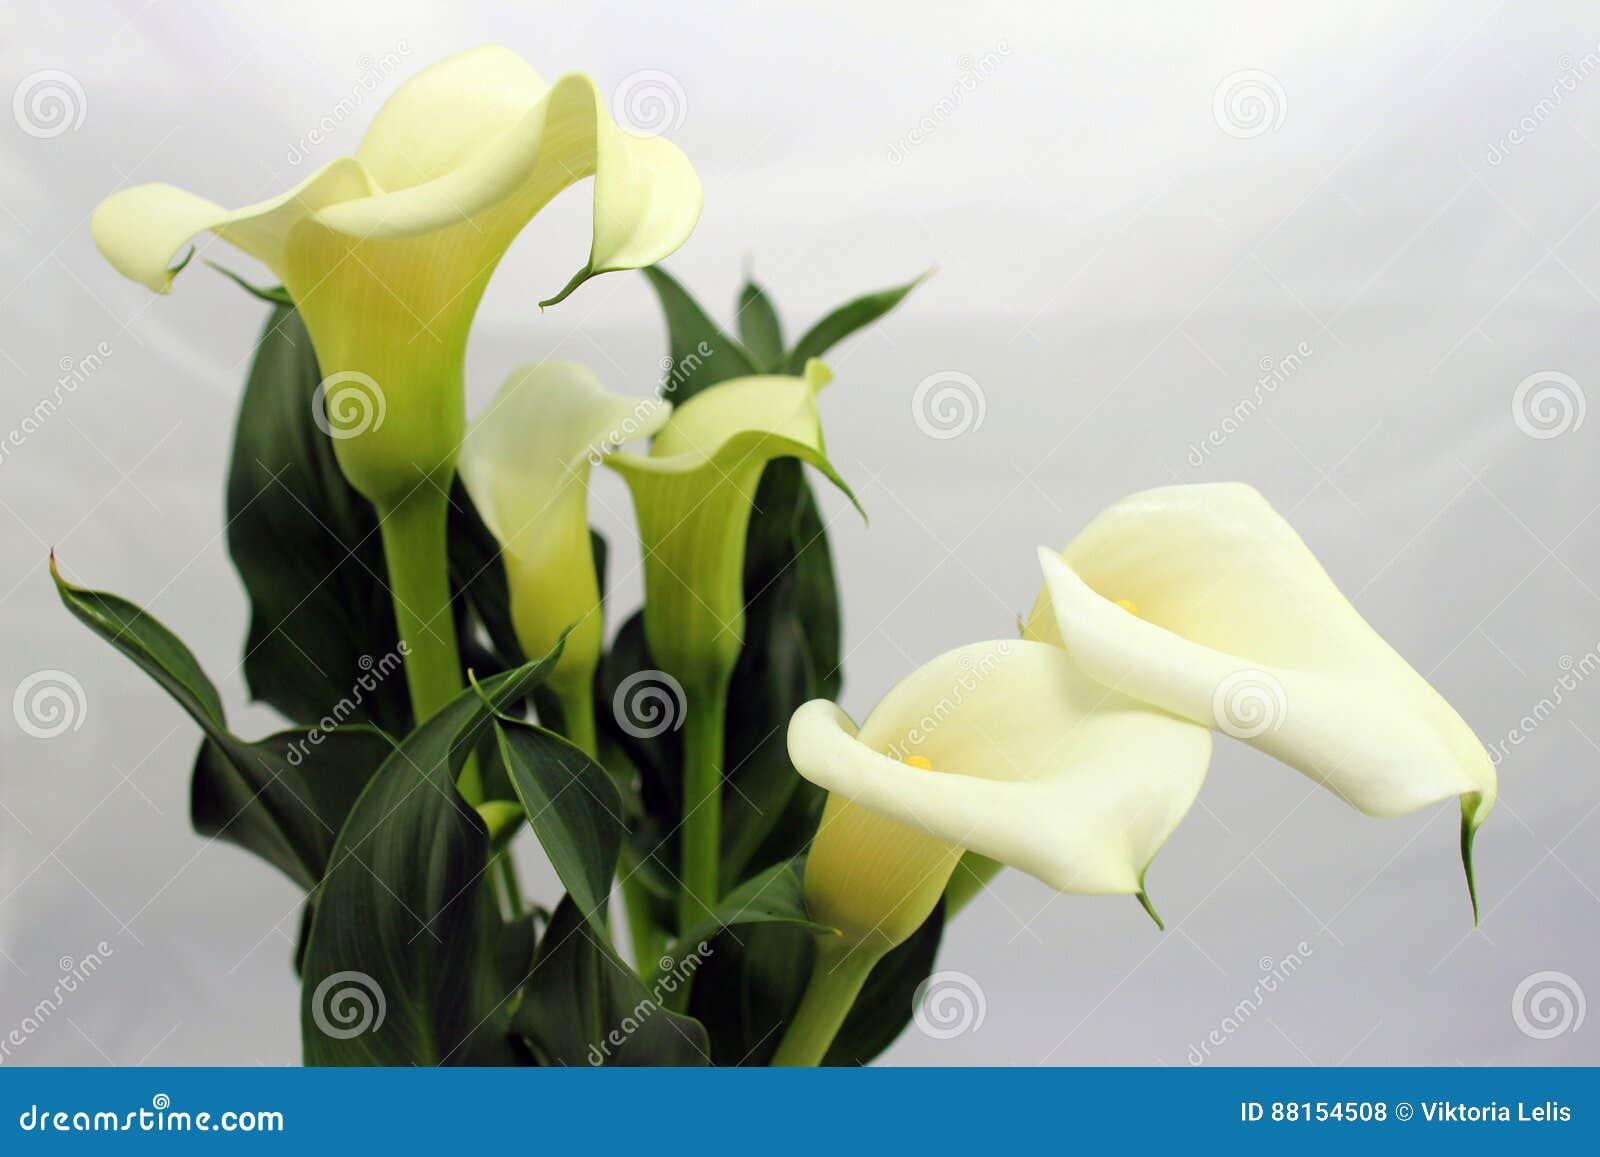 Calla lily flowers stock photo image of wedding beauty 88154508 calla lily flowers izmirmasajfo